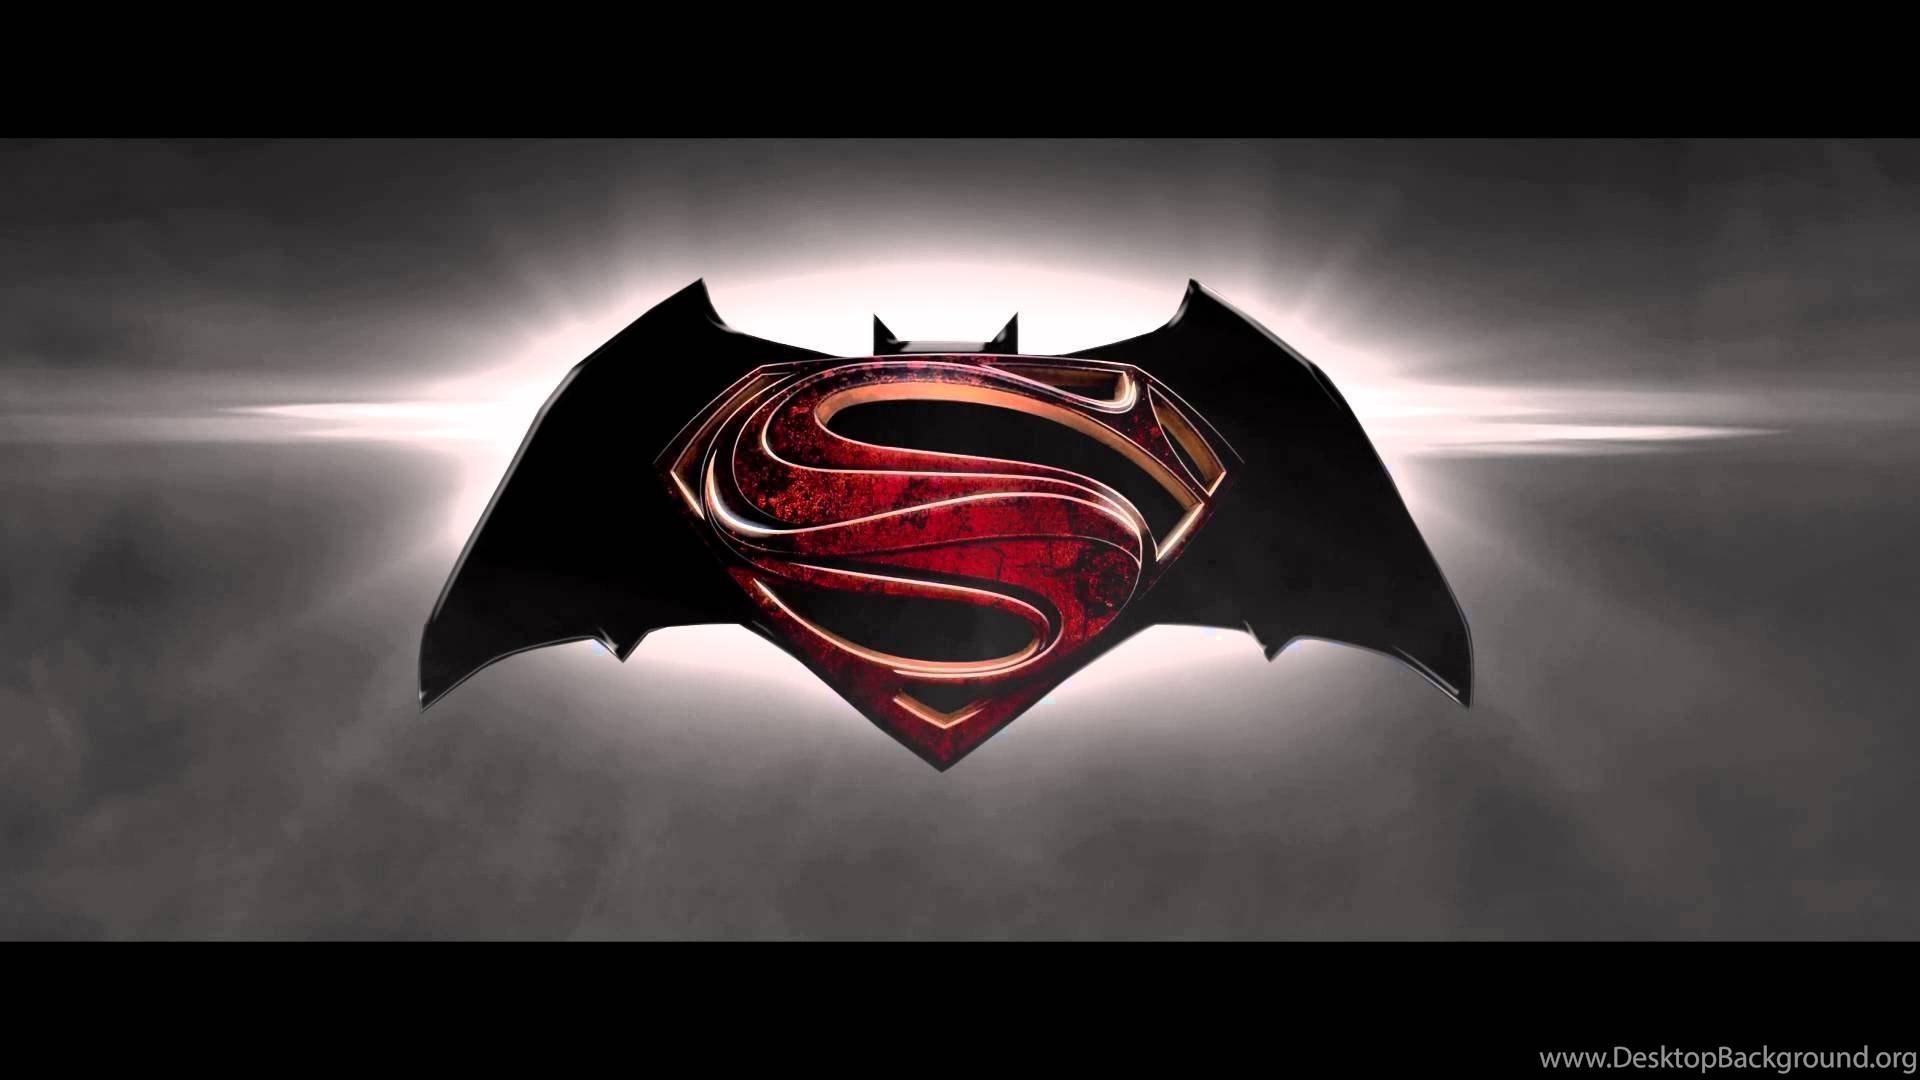 Download Batman Vs Superman Dawn Of Justice Iphone Wallpapers Size